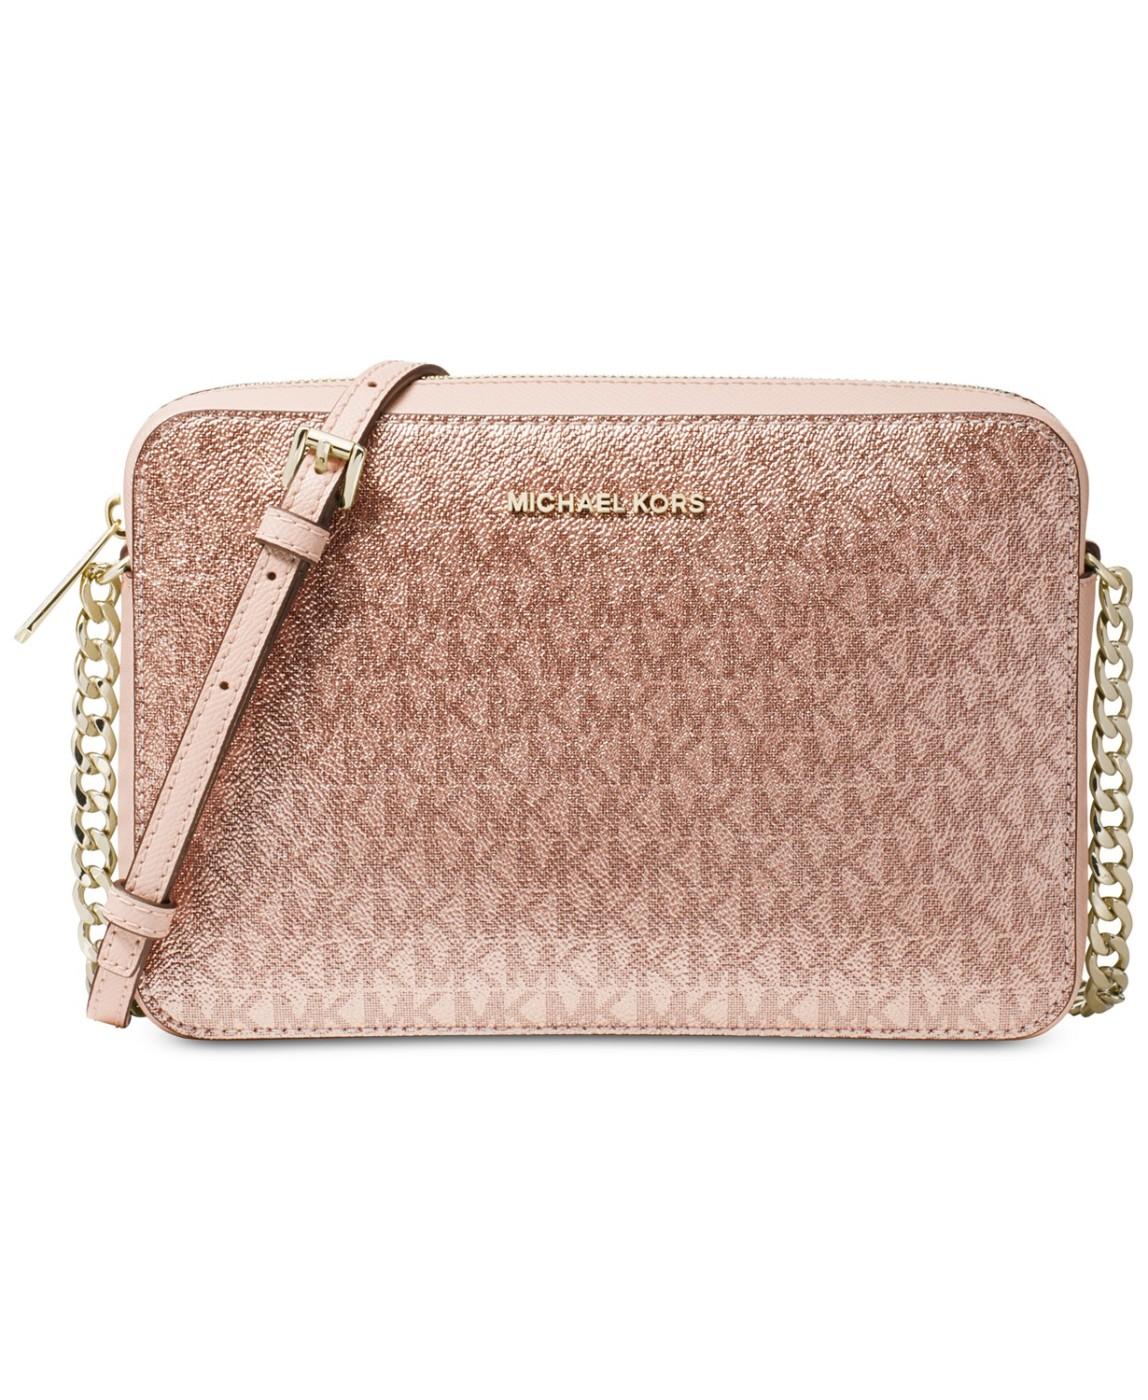 MICHAEL Michael Kors Pink Metallic Signature East West Crossbody Bag